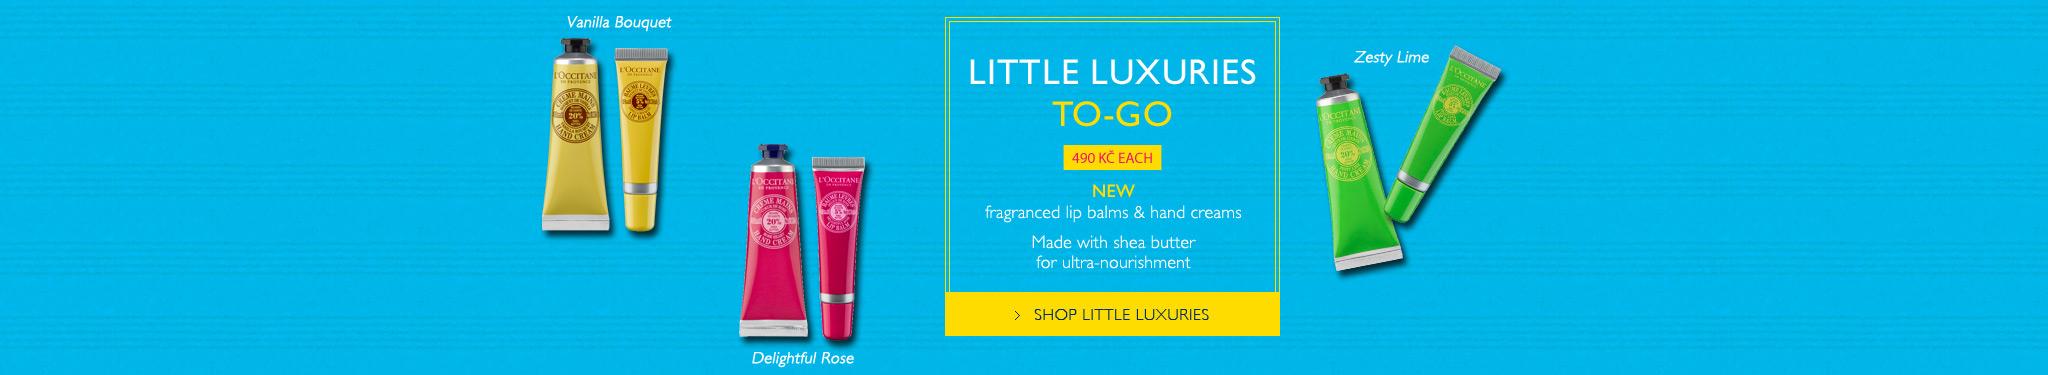 New fragranced lip balms & hand creams